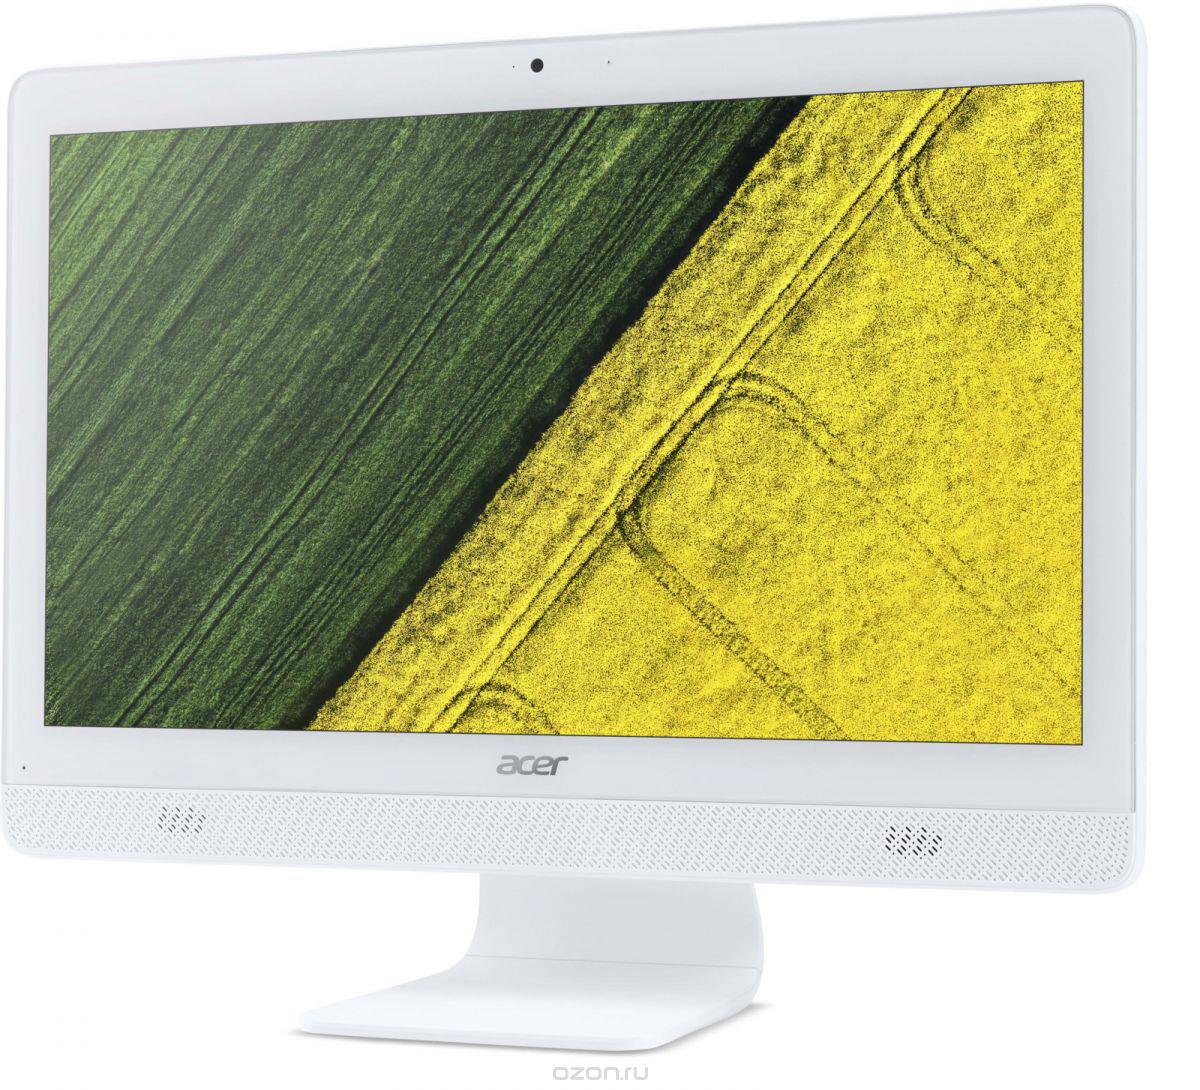 Моноблок Acer Aspire C20-820, DQ.BC6ER.003, 19.5, белый моноблок acer aspire c20 720 dq b6zer 009 белый